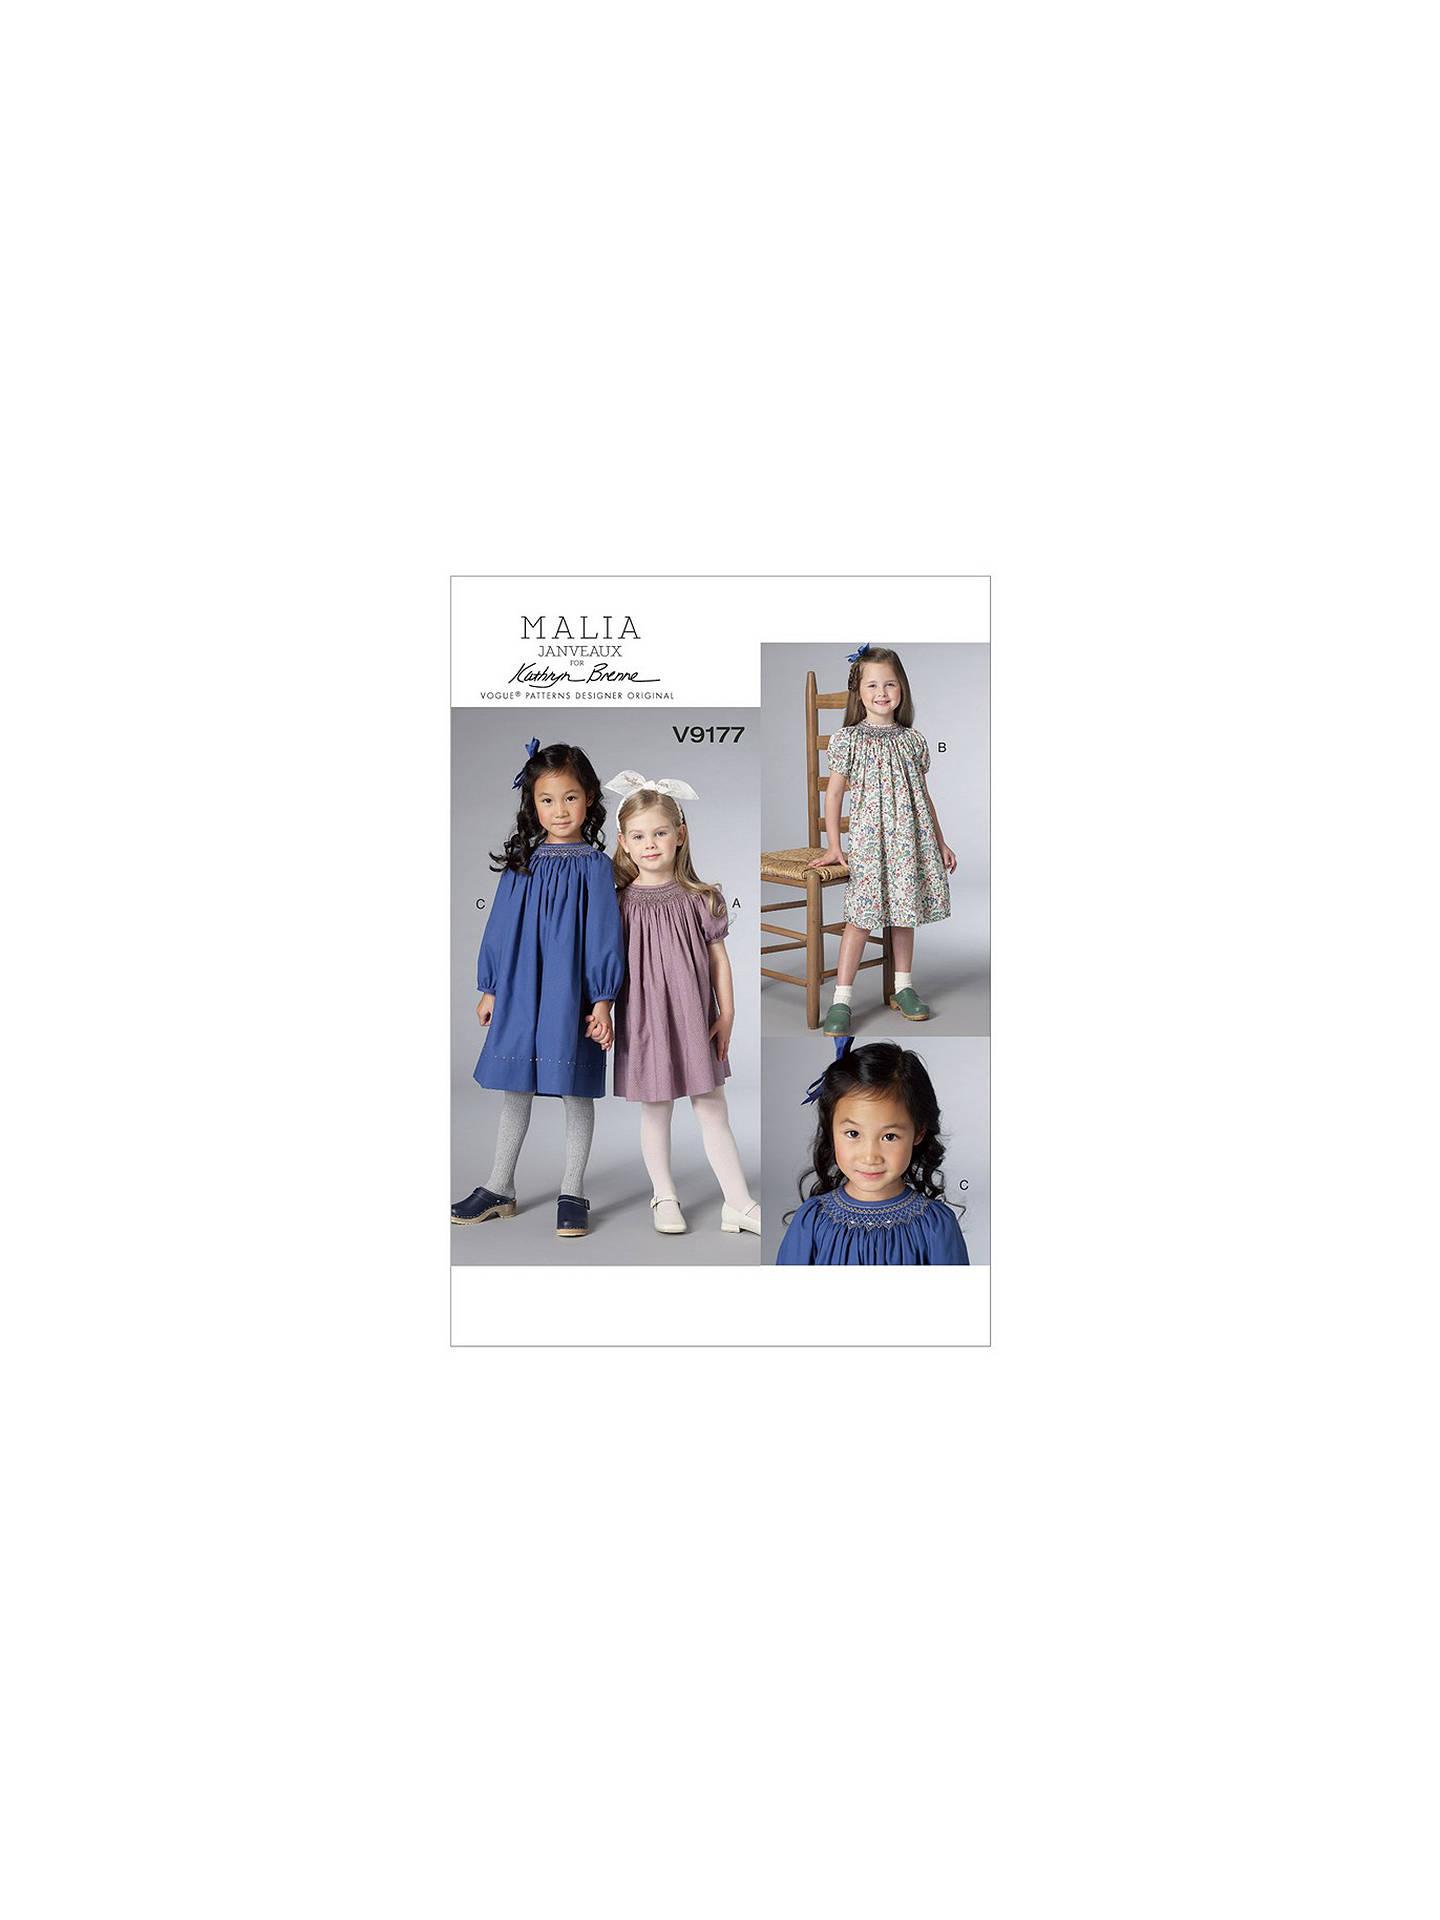 Vogue Children\'s Dresses Sewing Pattern, 9177 at John Lewis & Partners